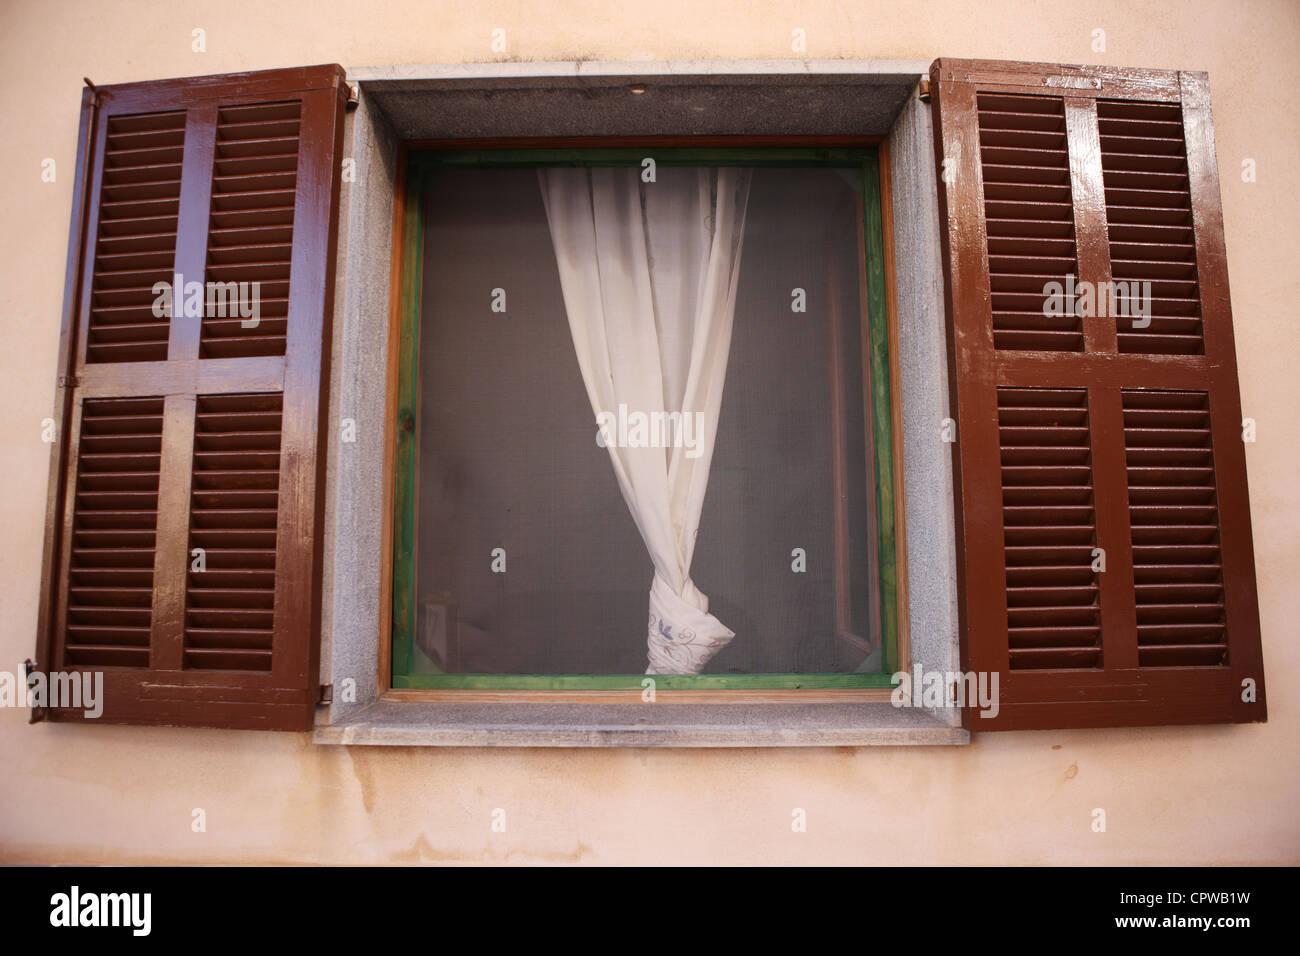 Spanien, Mallorca, 20120524, Haus auf Mallorca Stock Photo